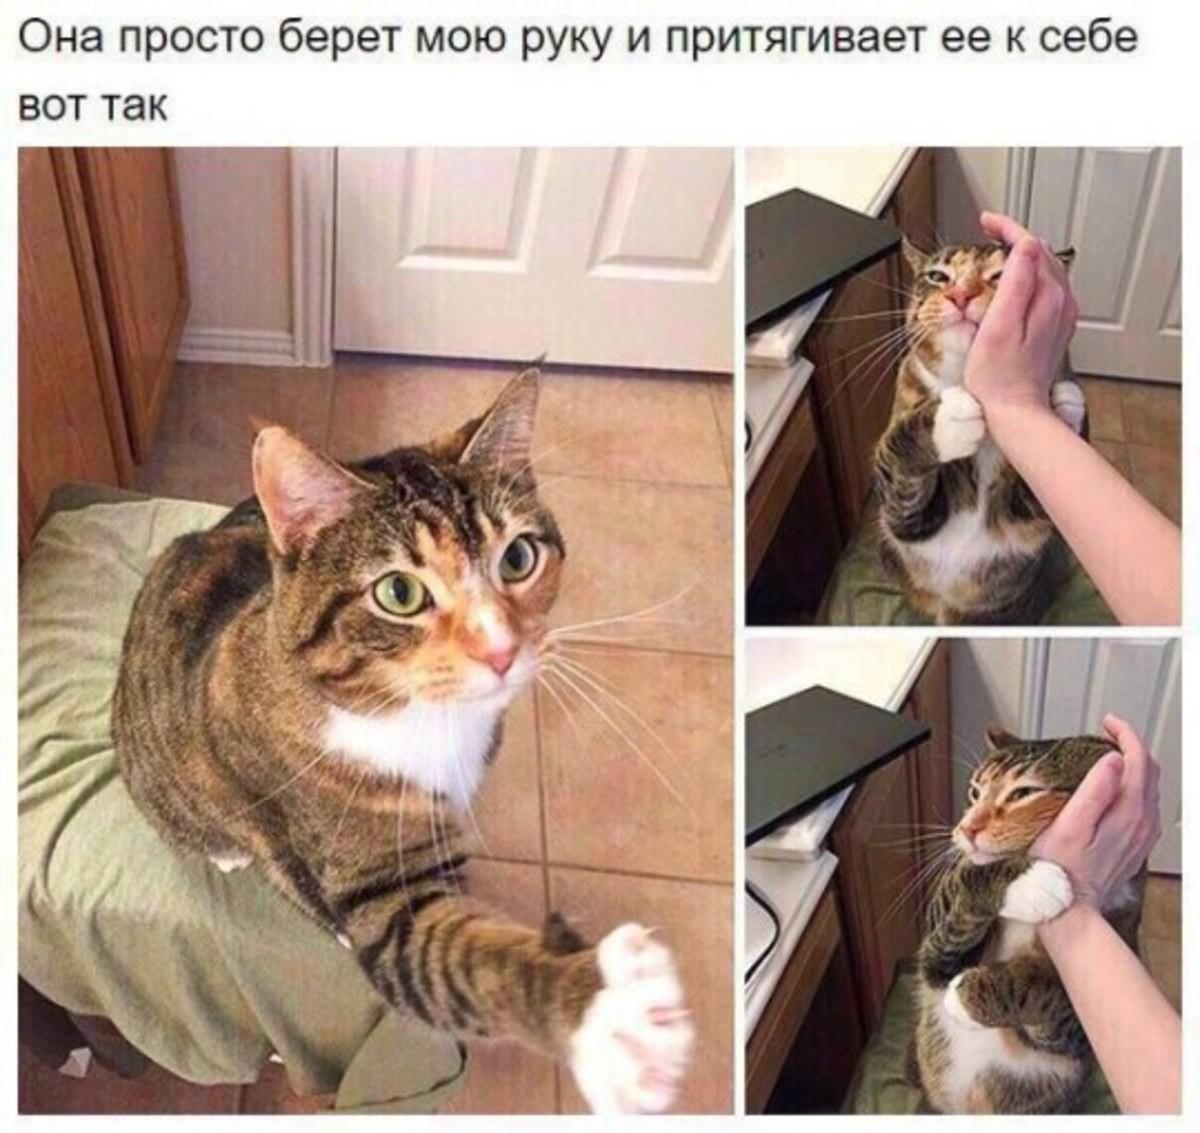 Cats are God's gift to humans. . BOT Tax. I don't speak cheeki breeki, can some cyka translate?